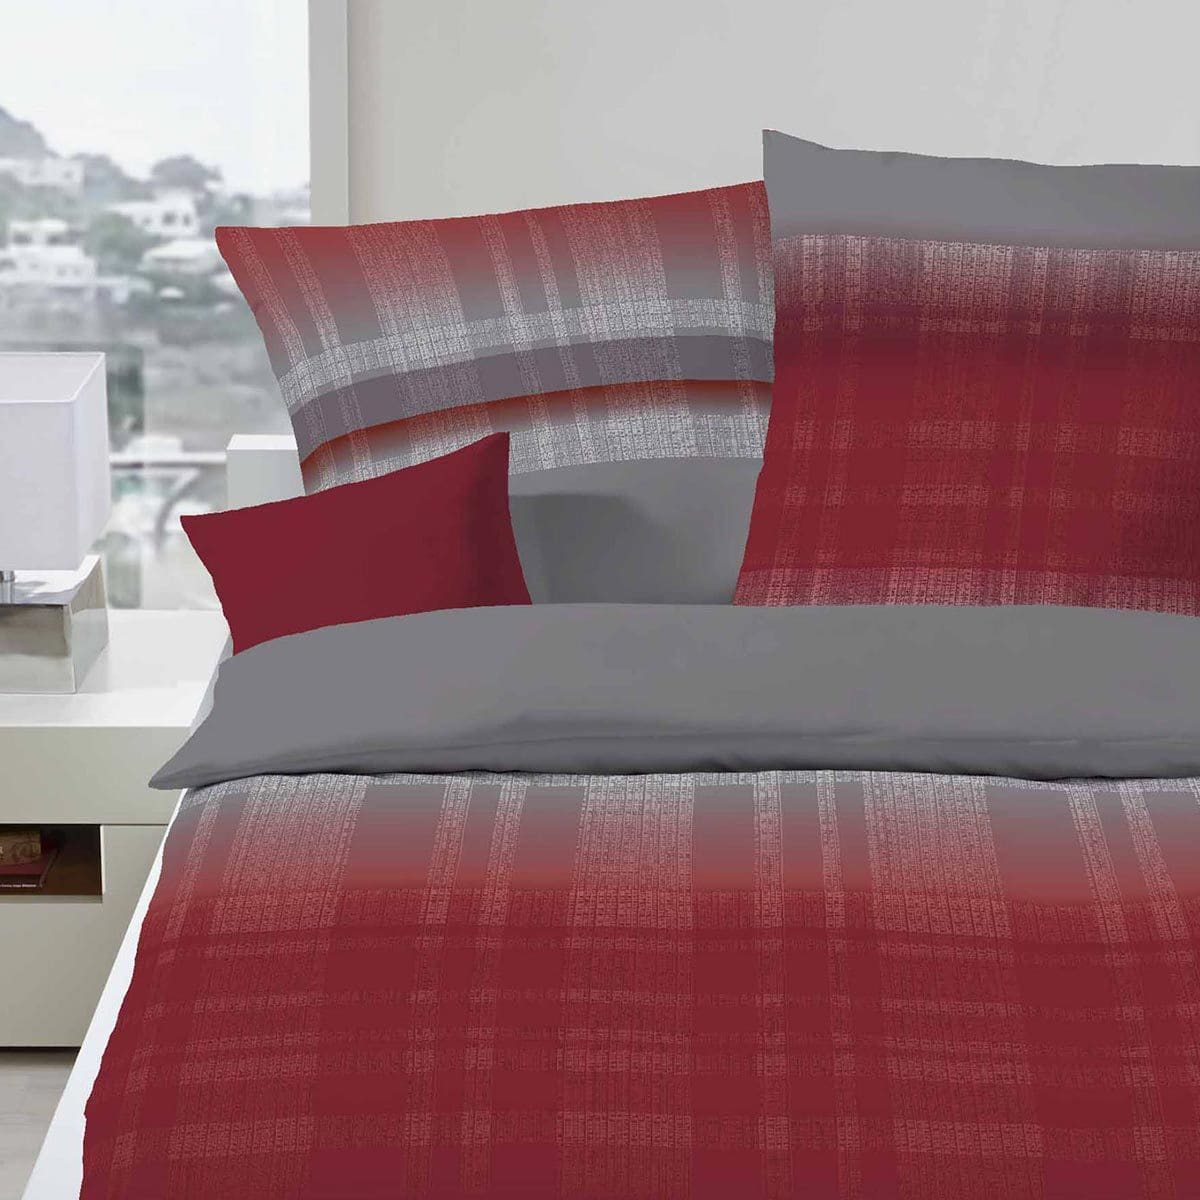 kaeppel biber bettw sche trace karmin g nstig online kaufen bei bettwaren shop. Black Bedroom Furniture Sets. Home Design Ideas